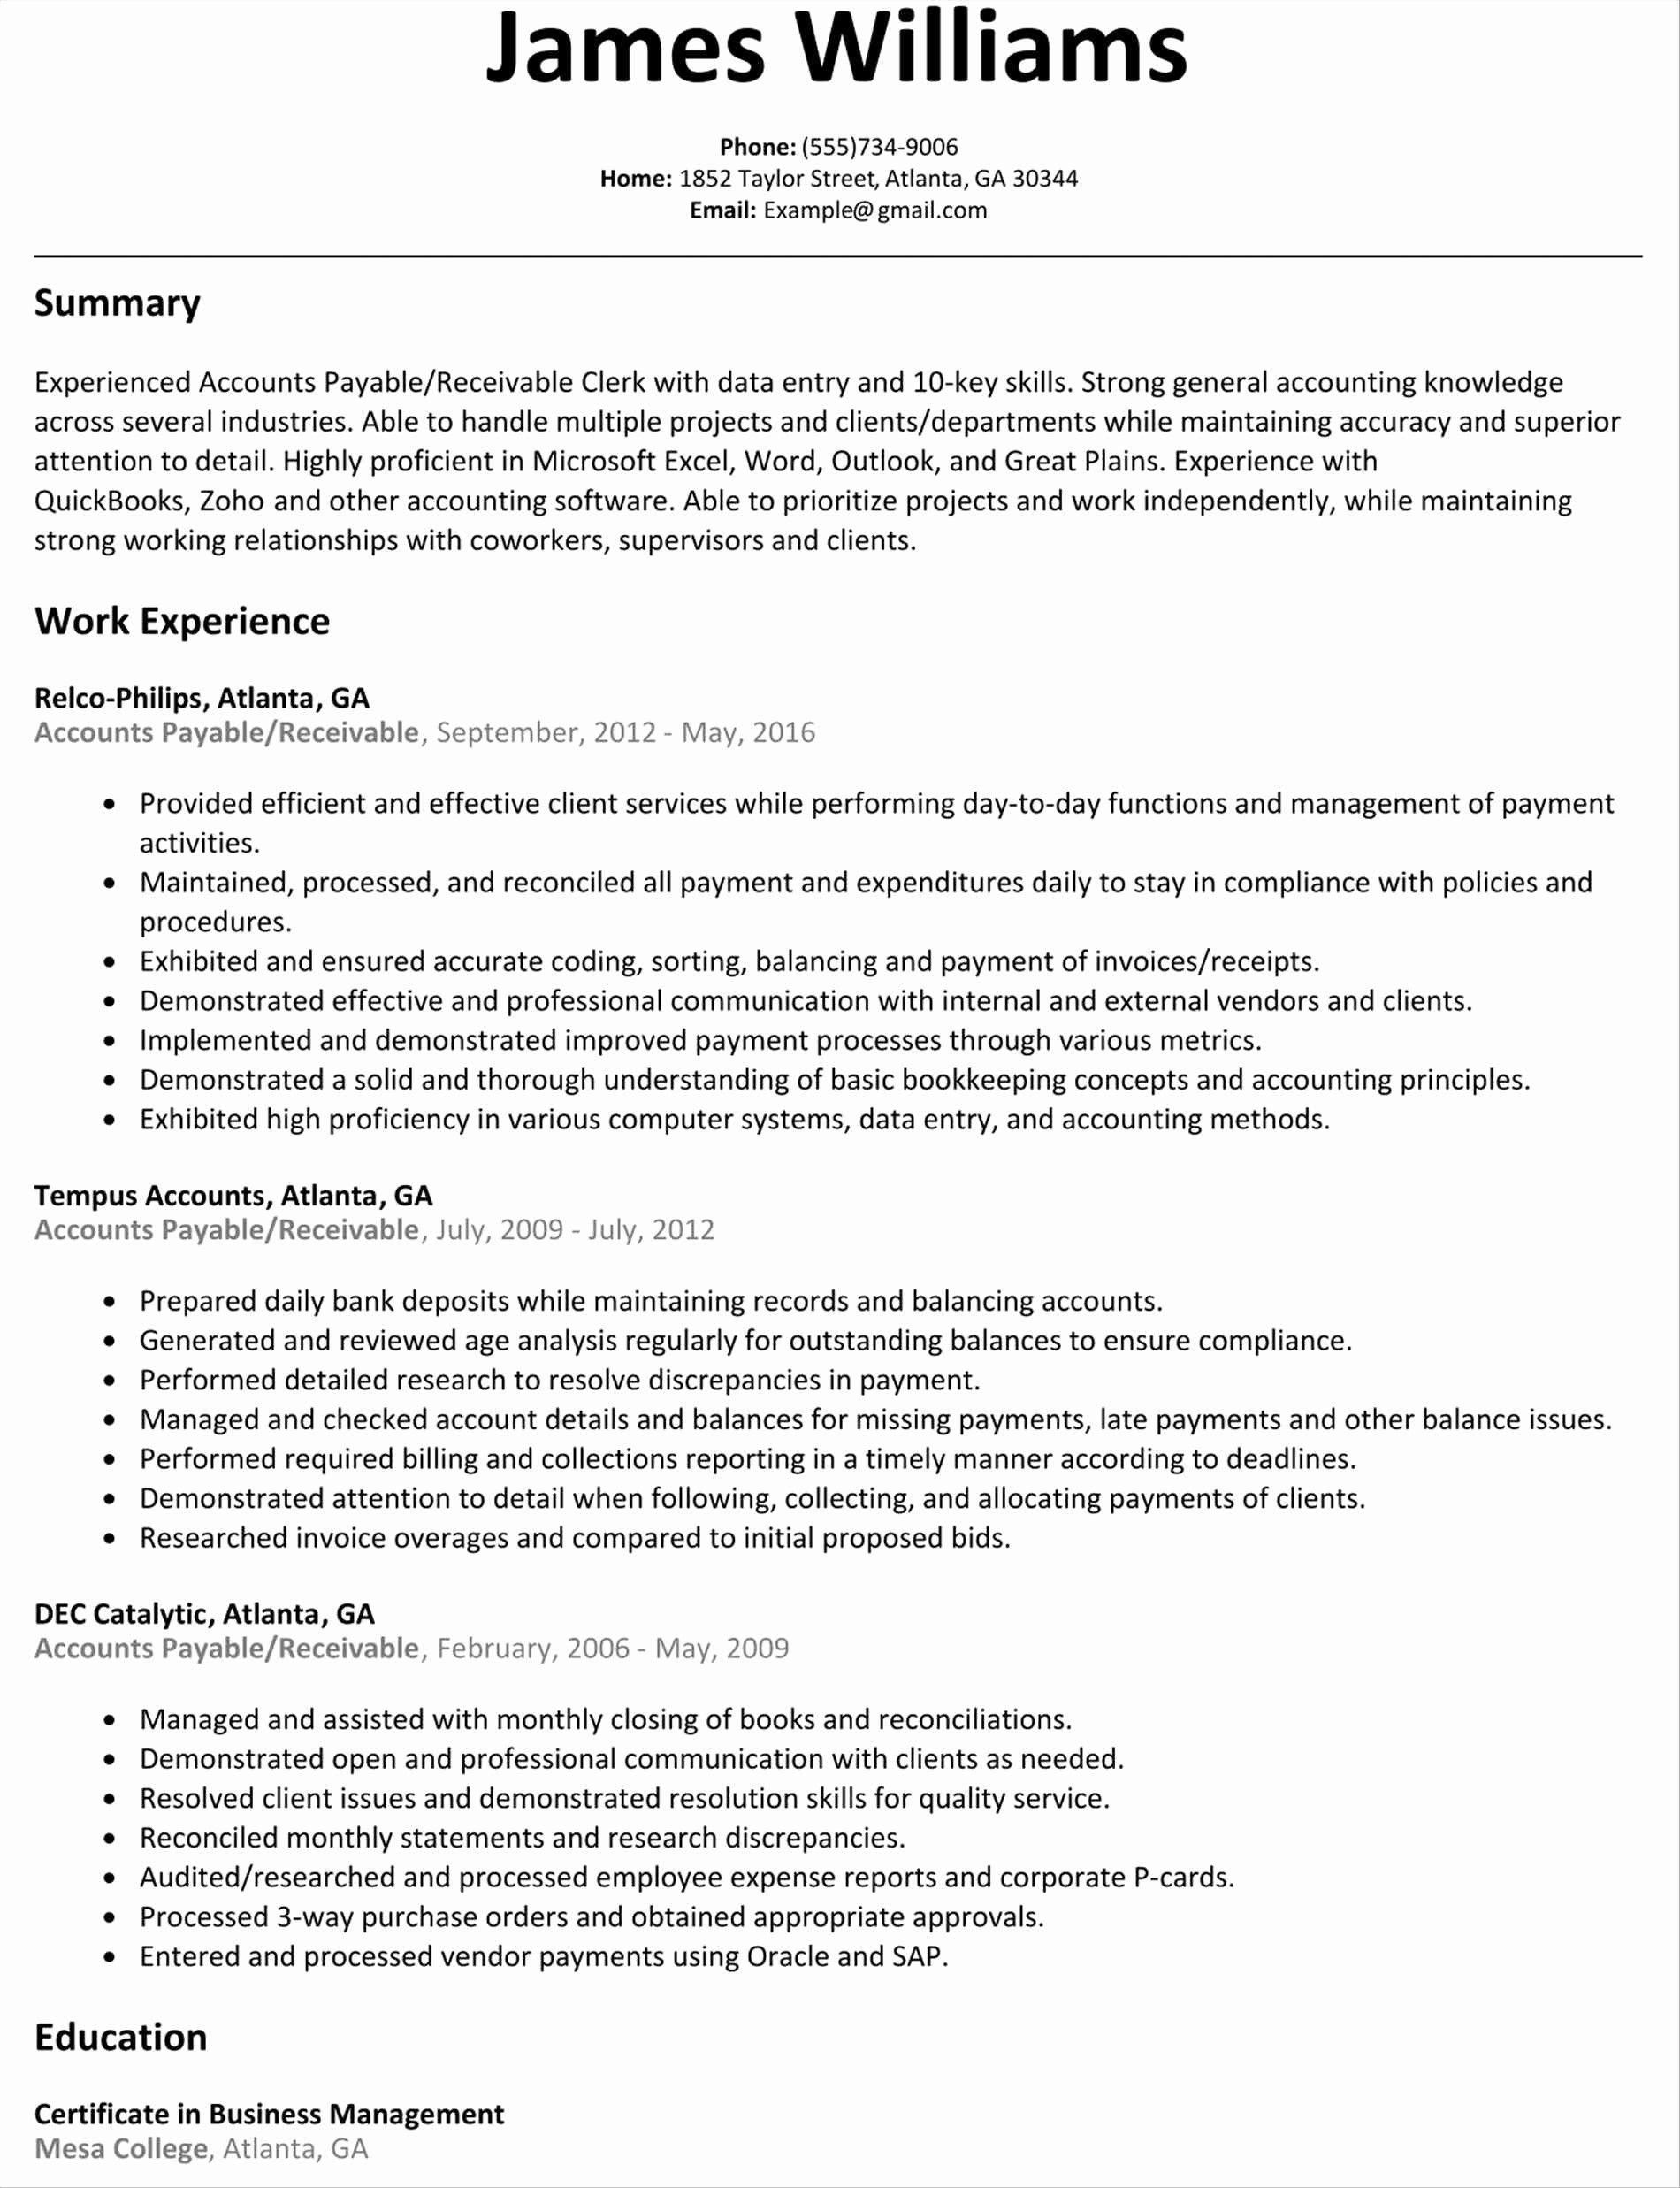 Resume Format For Zoho Job Resume Examples Resume Format